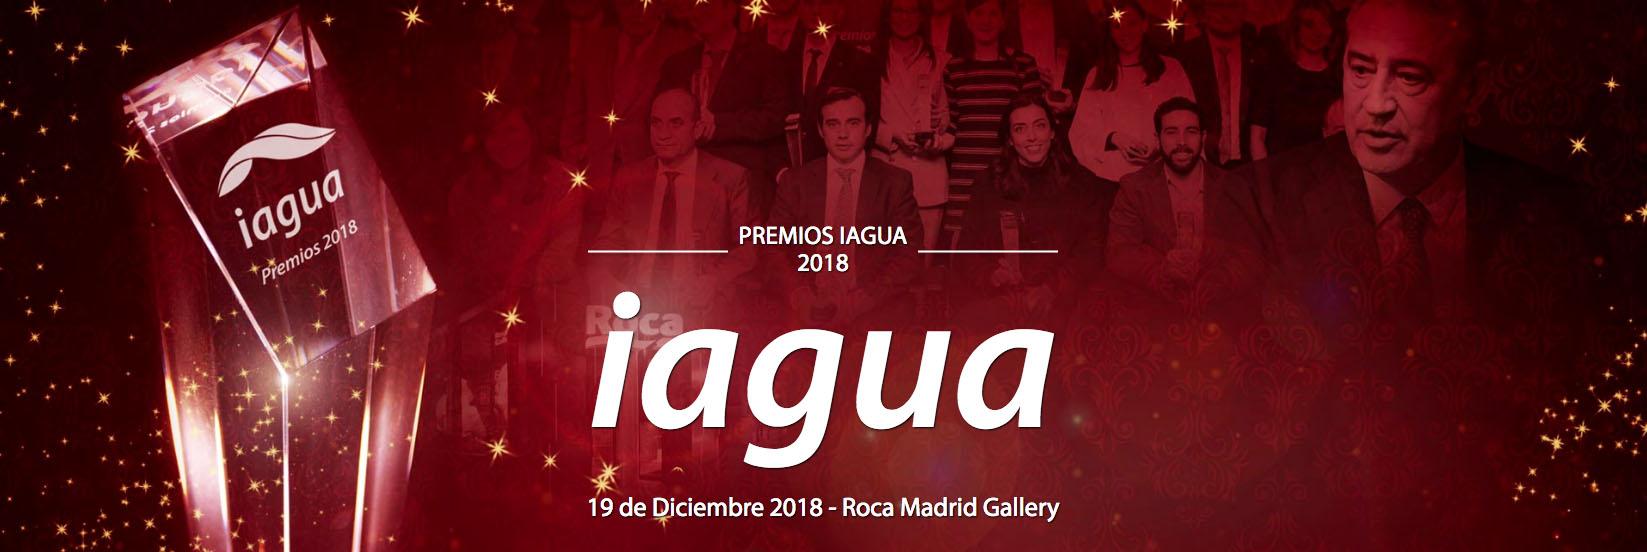 PREMIOS IAGUA 2018